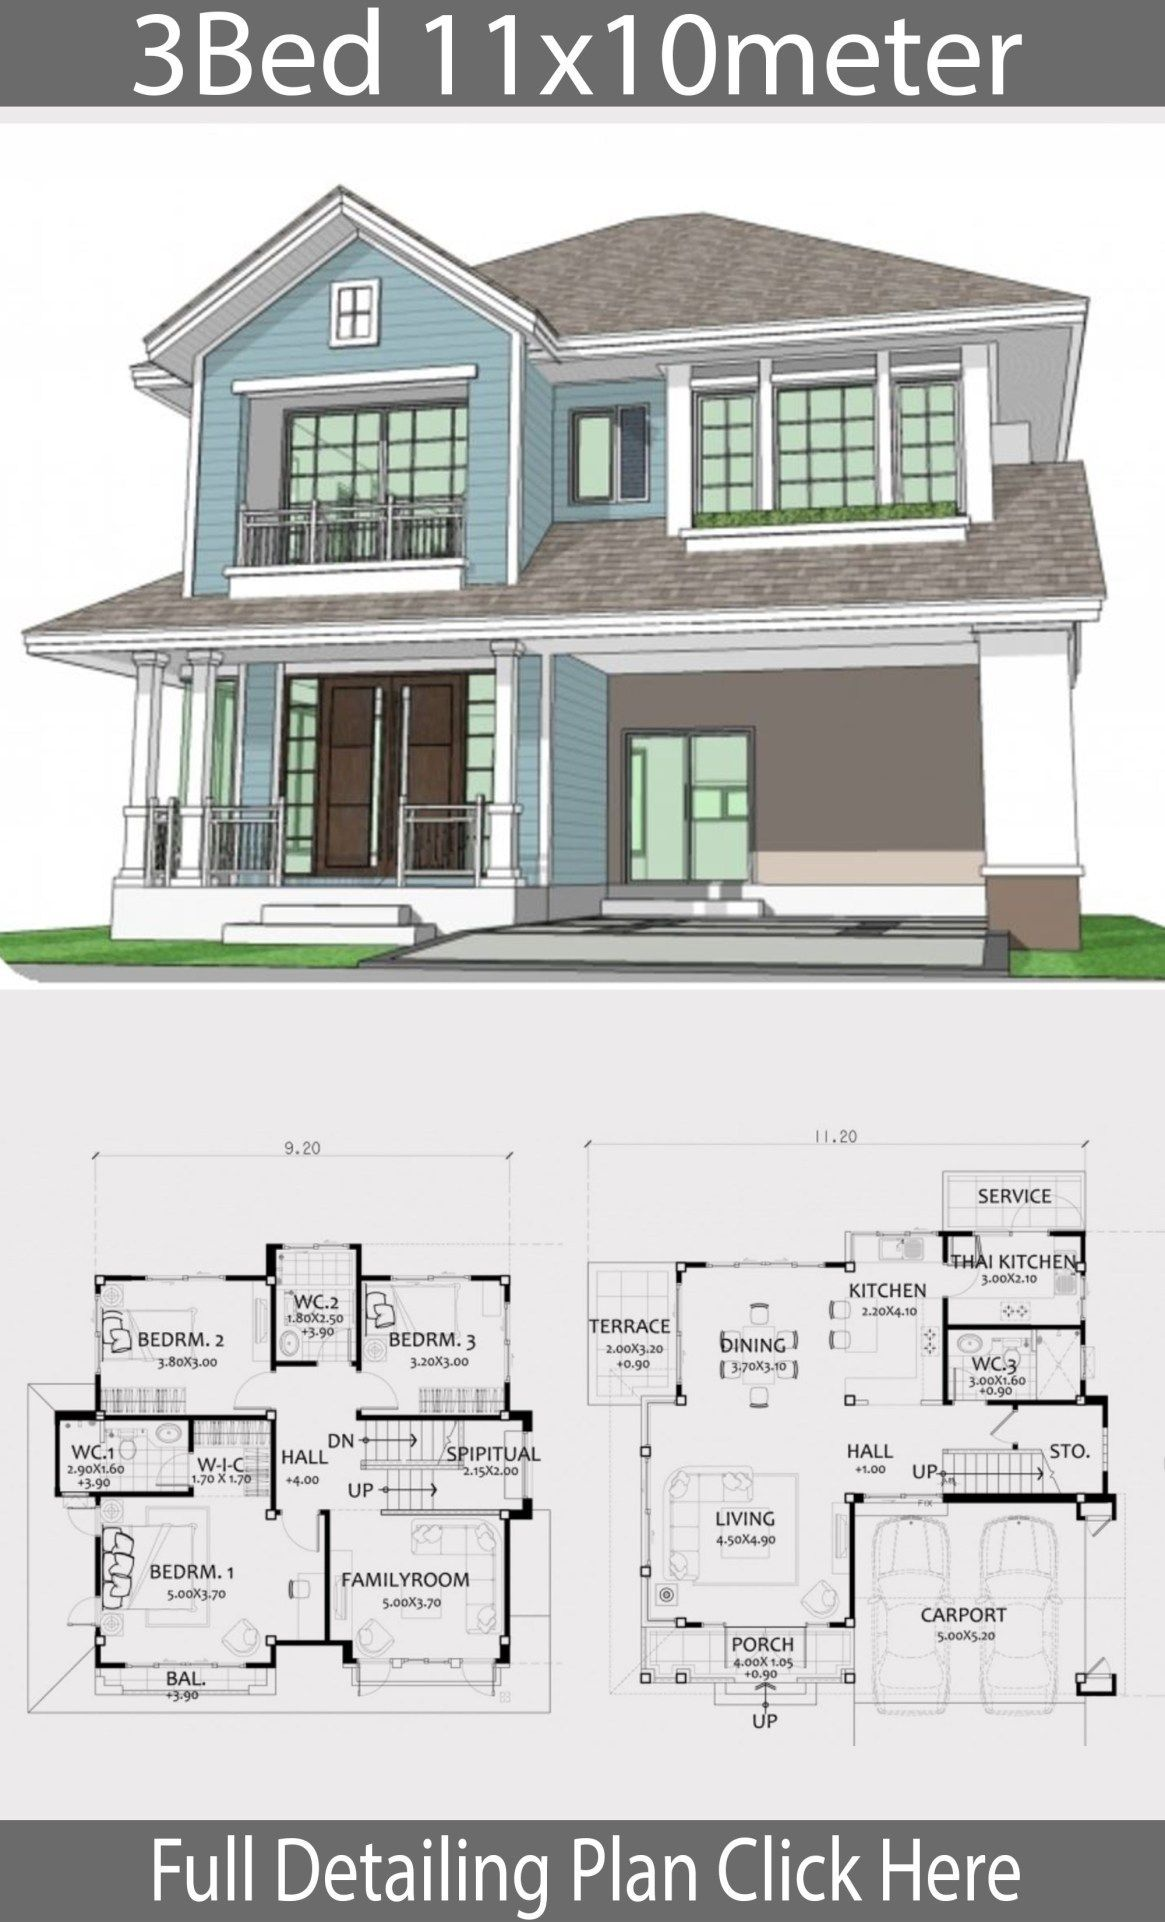 Marvelous Home Plans And Designs For Your Dream Home Ideas House Design Home Design Plan Modern Farmhouse Plans